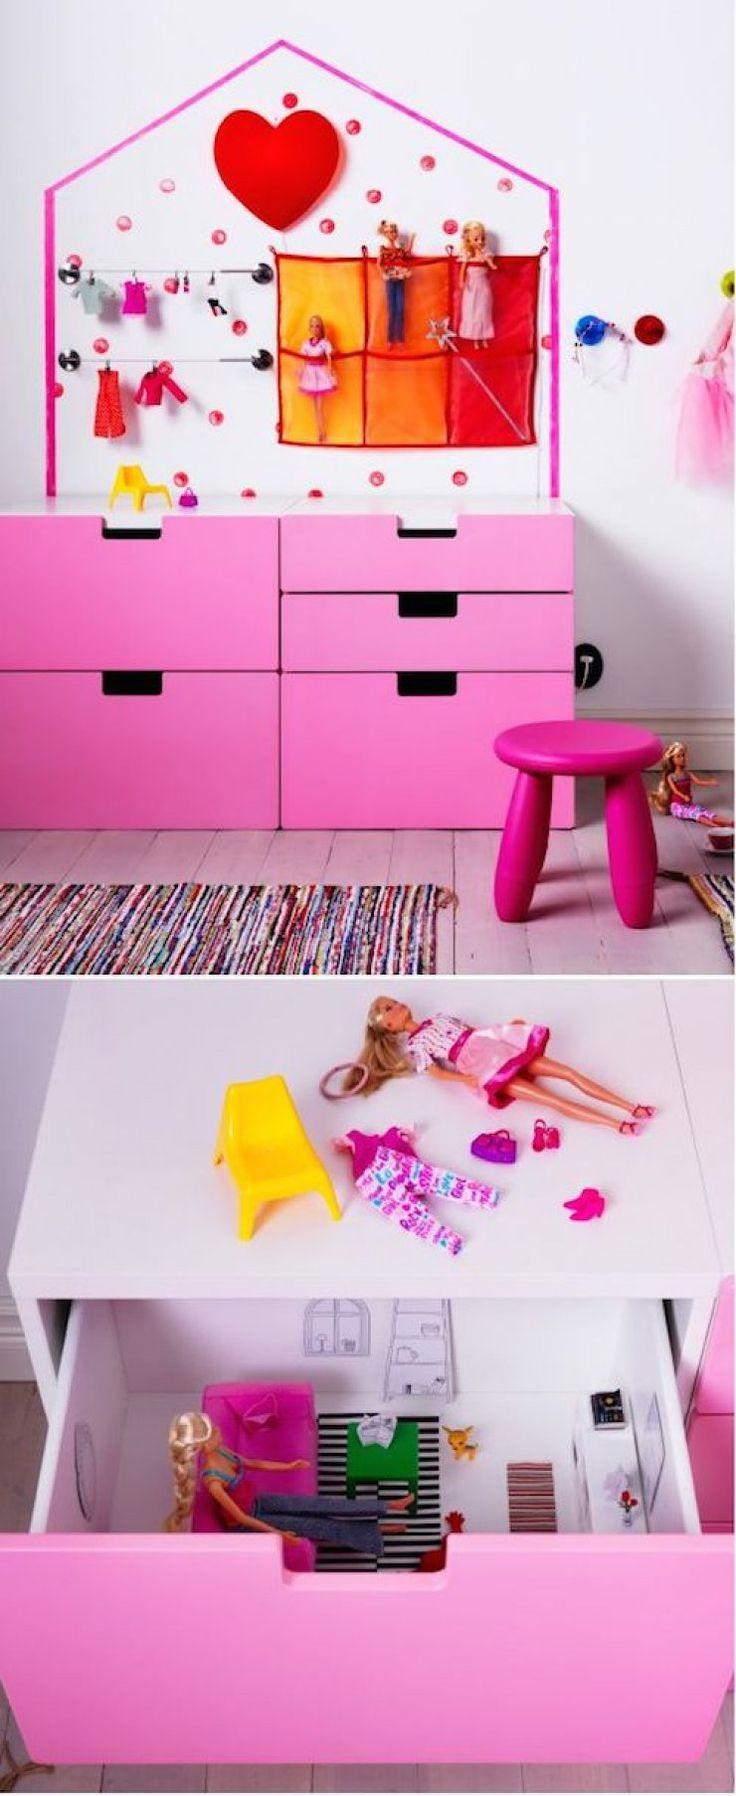 222 best kids room images on pinterest | children, kidsroom and